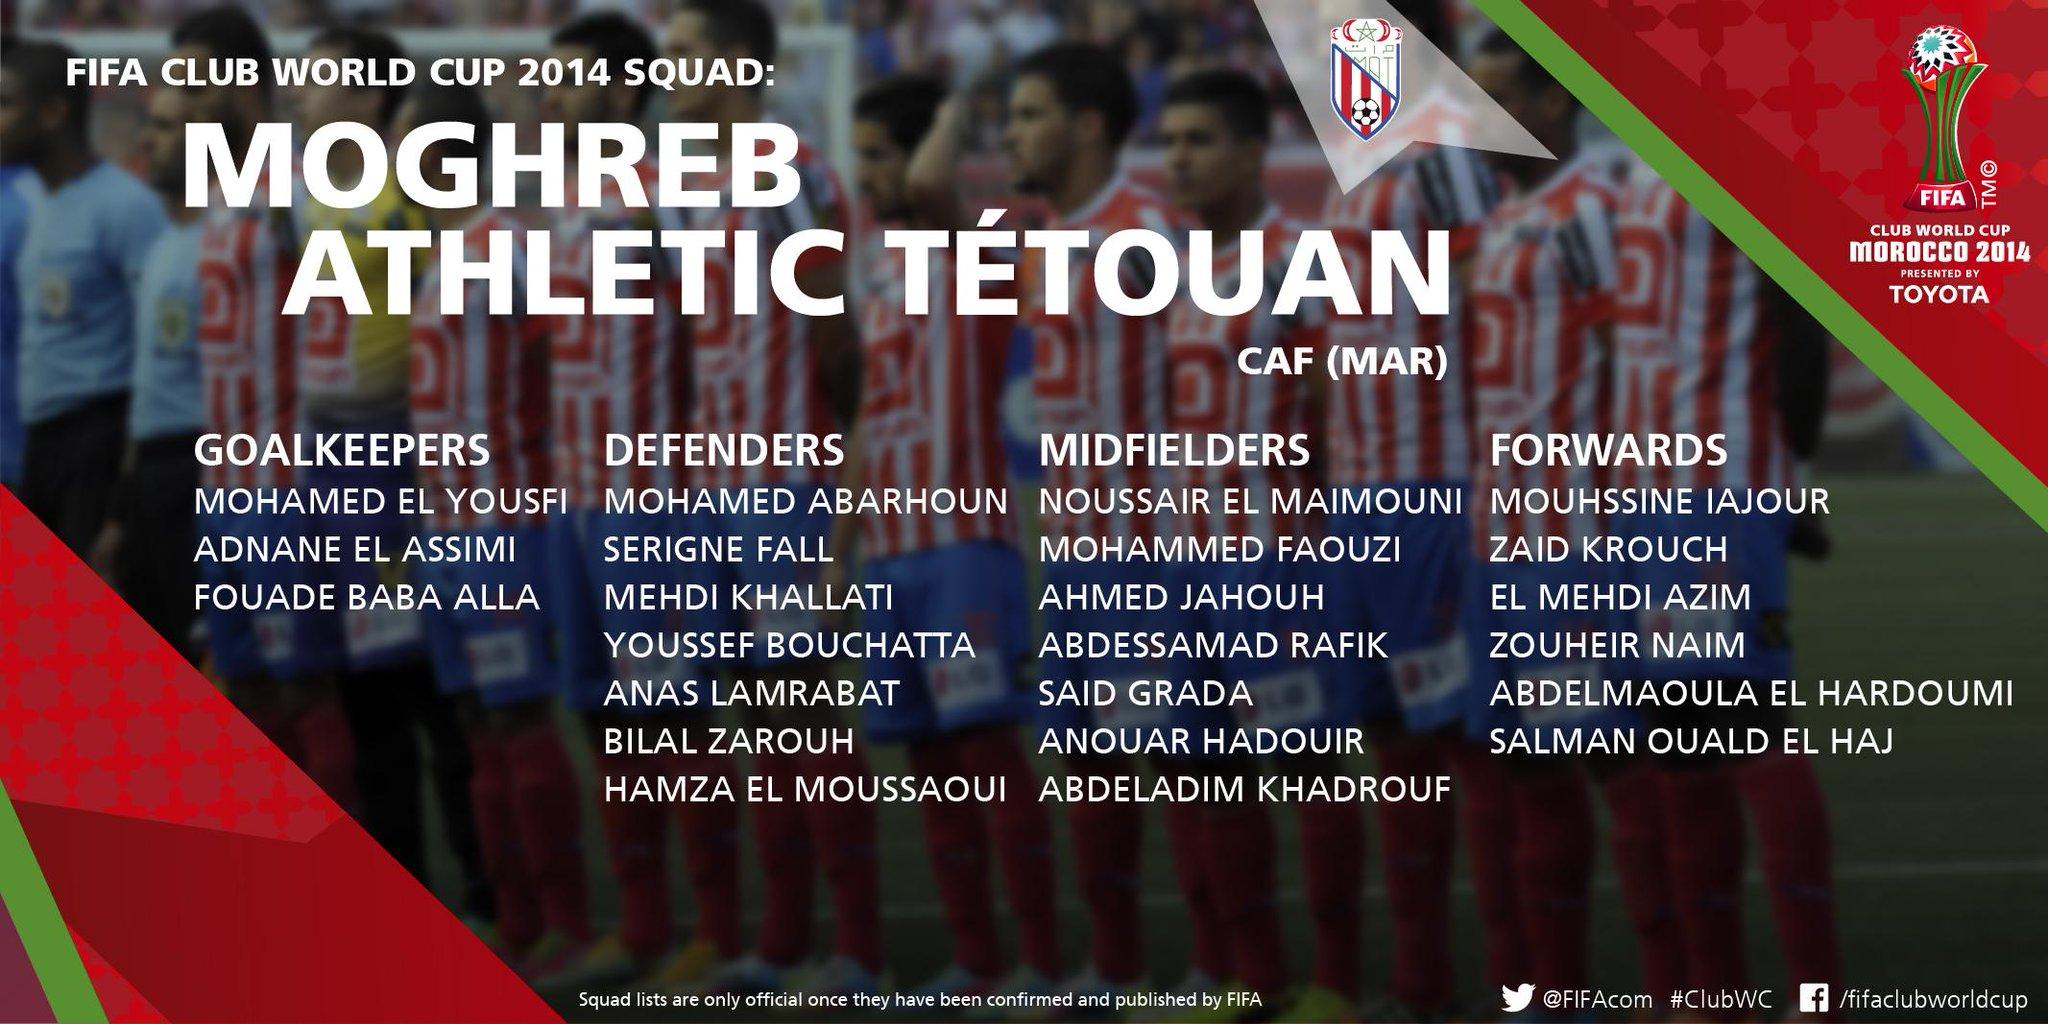 Copa Mundial De Clubes De La FIFA Marruecos 2014